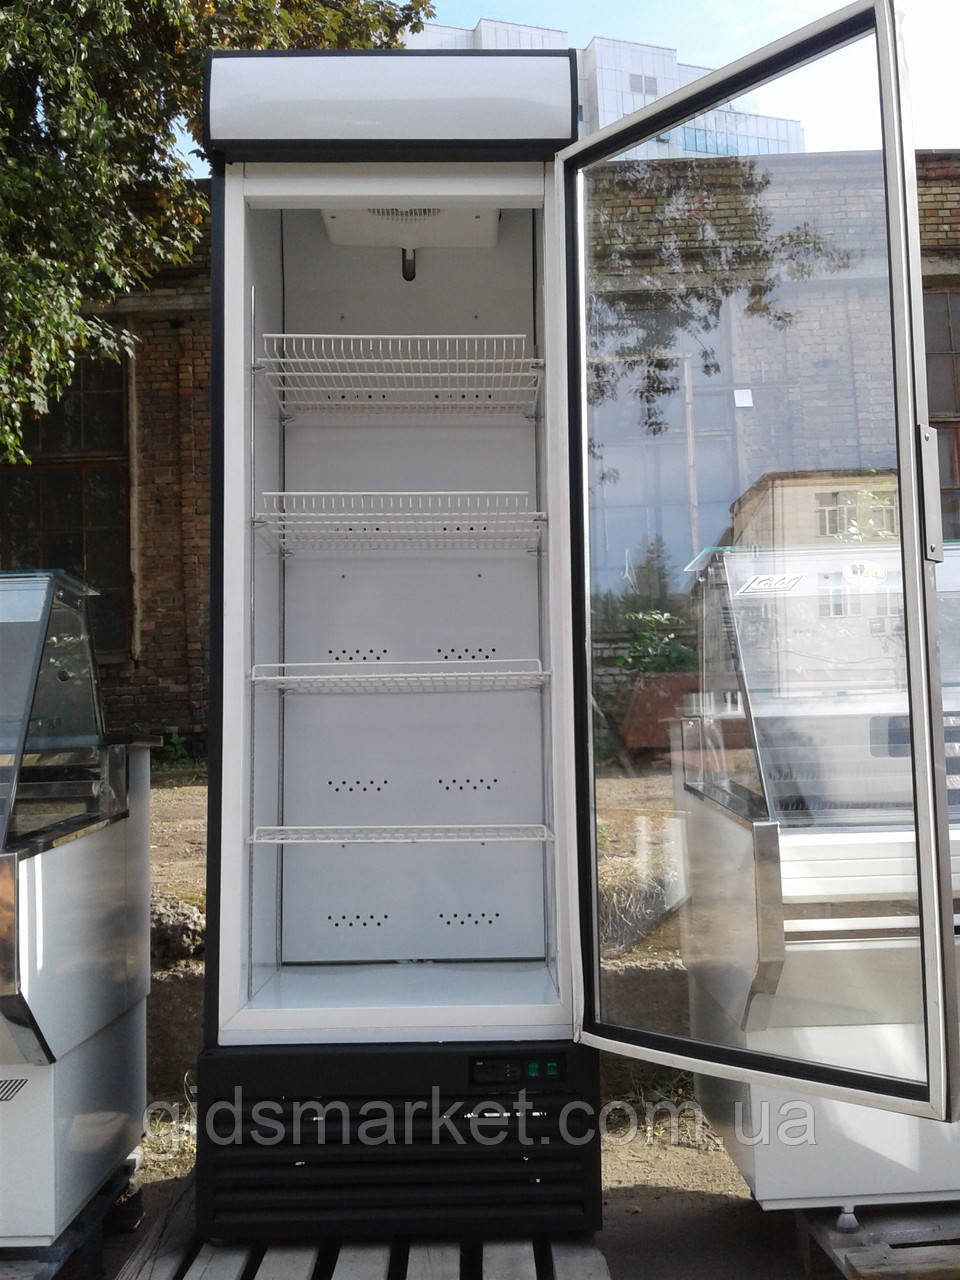 Холодильный шкафчик Ice Stream б/у, шкаф витрина б у, шкаф холодильный б у